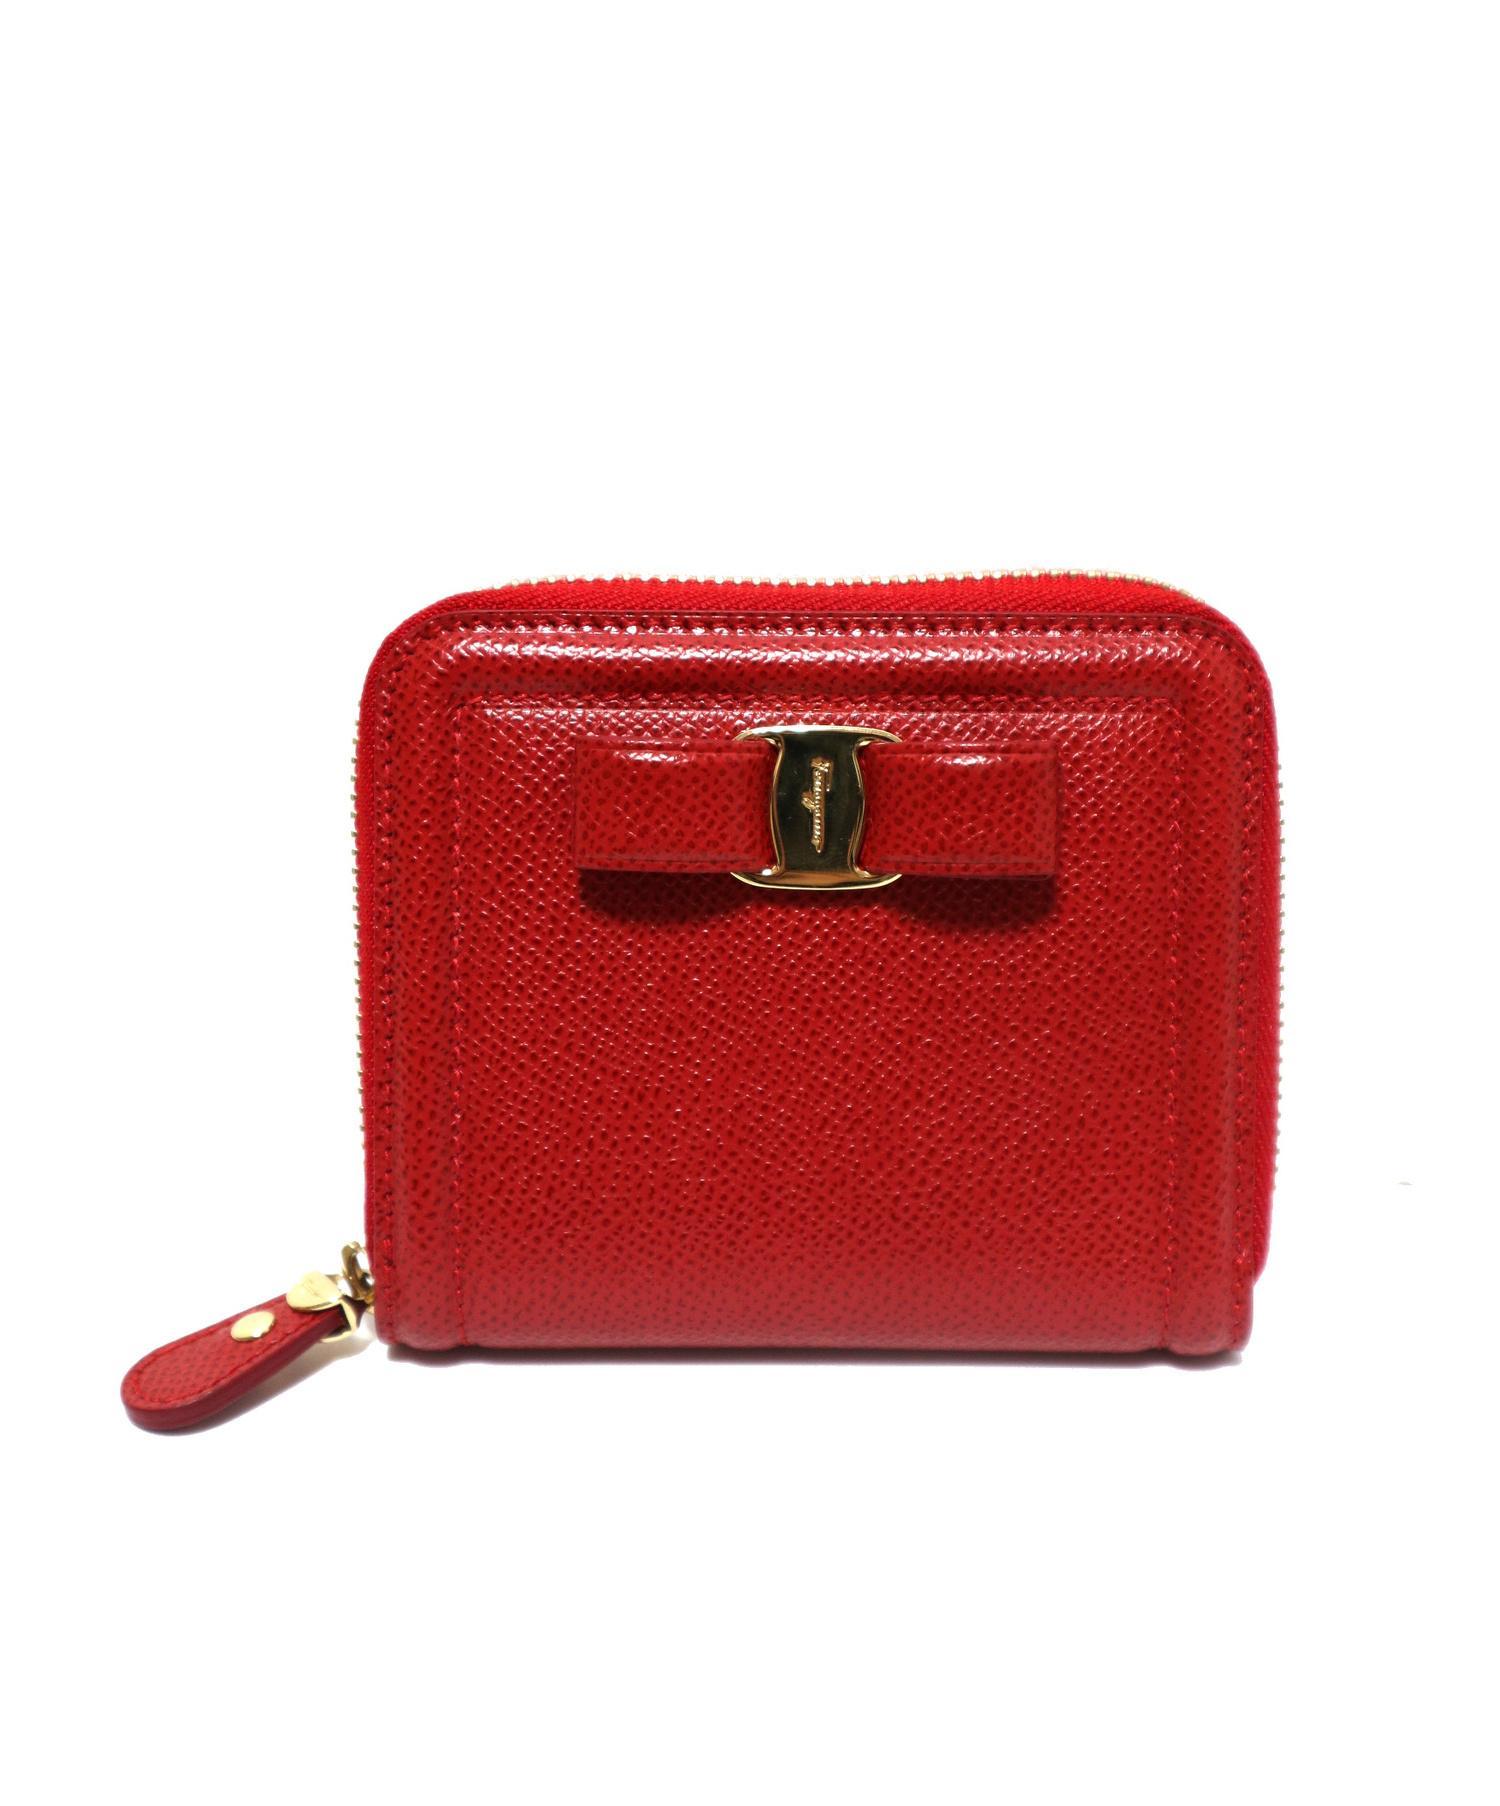 on sale 9759d 9fa34 [中古]Salvatore Ferragamo(サルヴァトーレ フェラガモ)のレディース 服飾小物 2つ折り財布